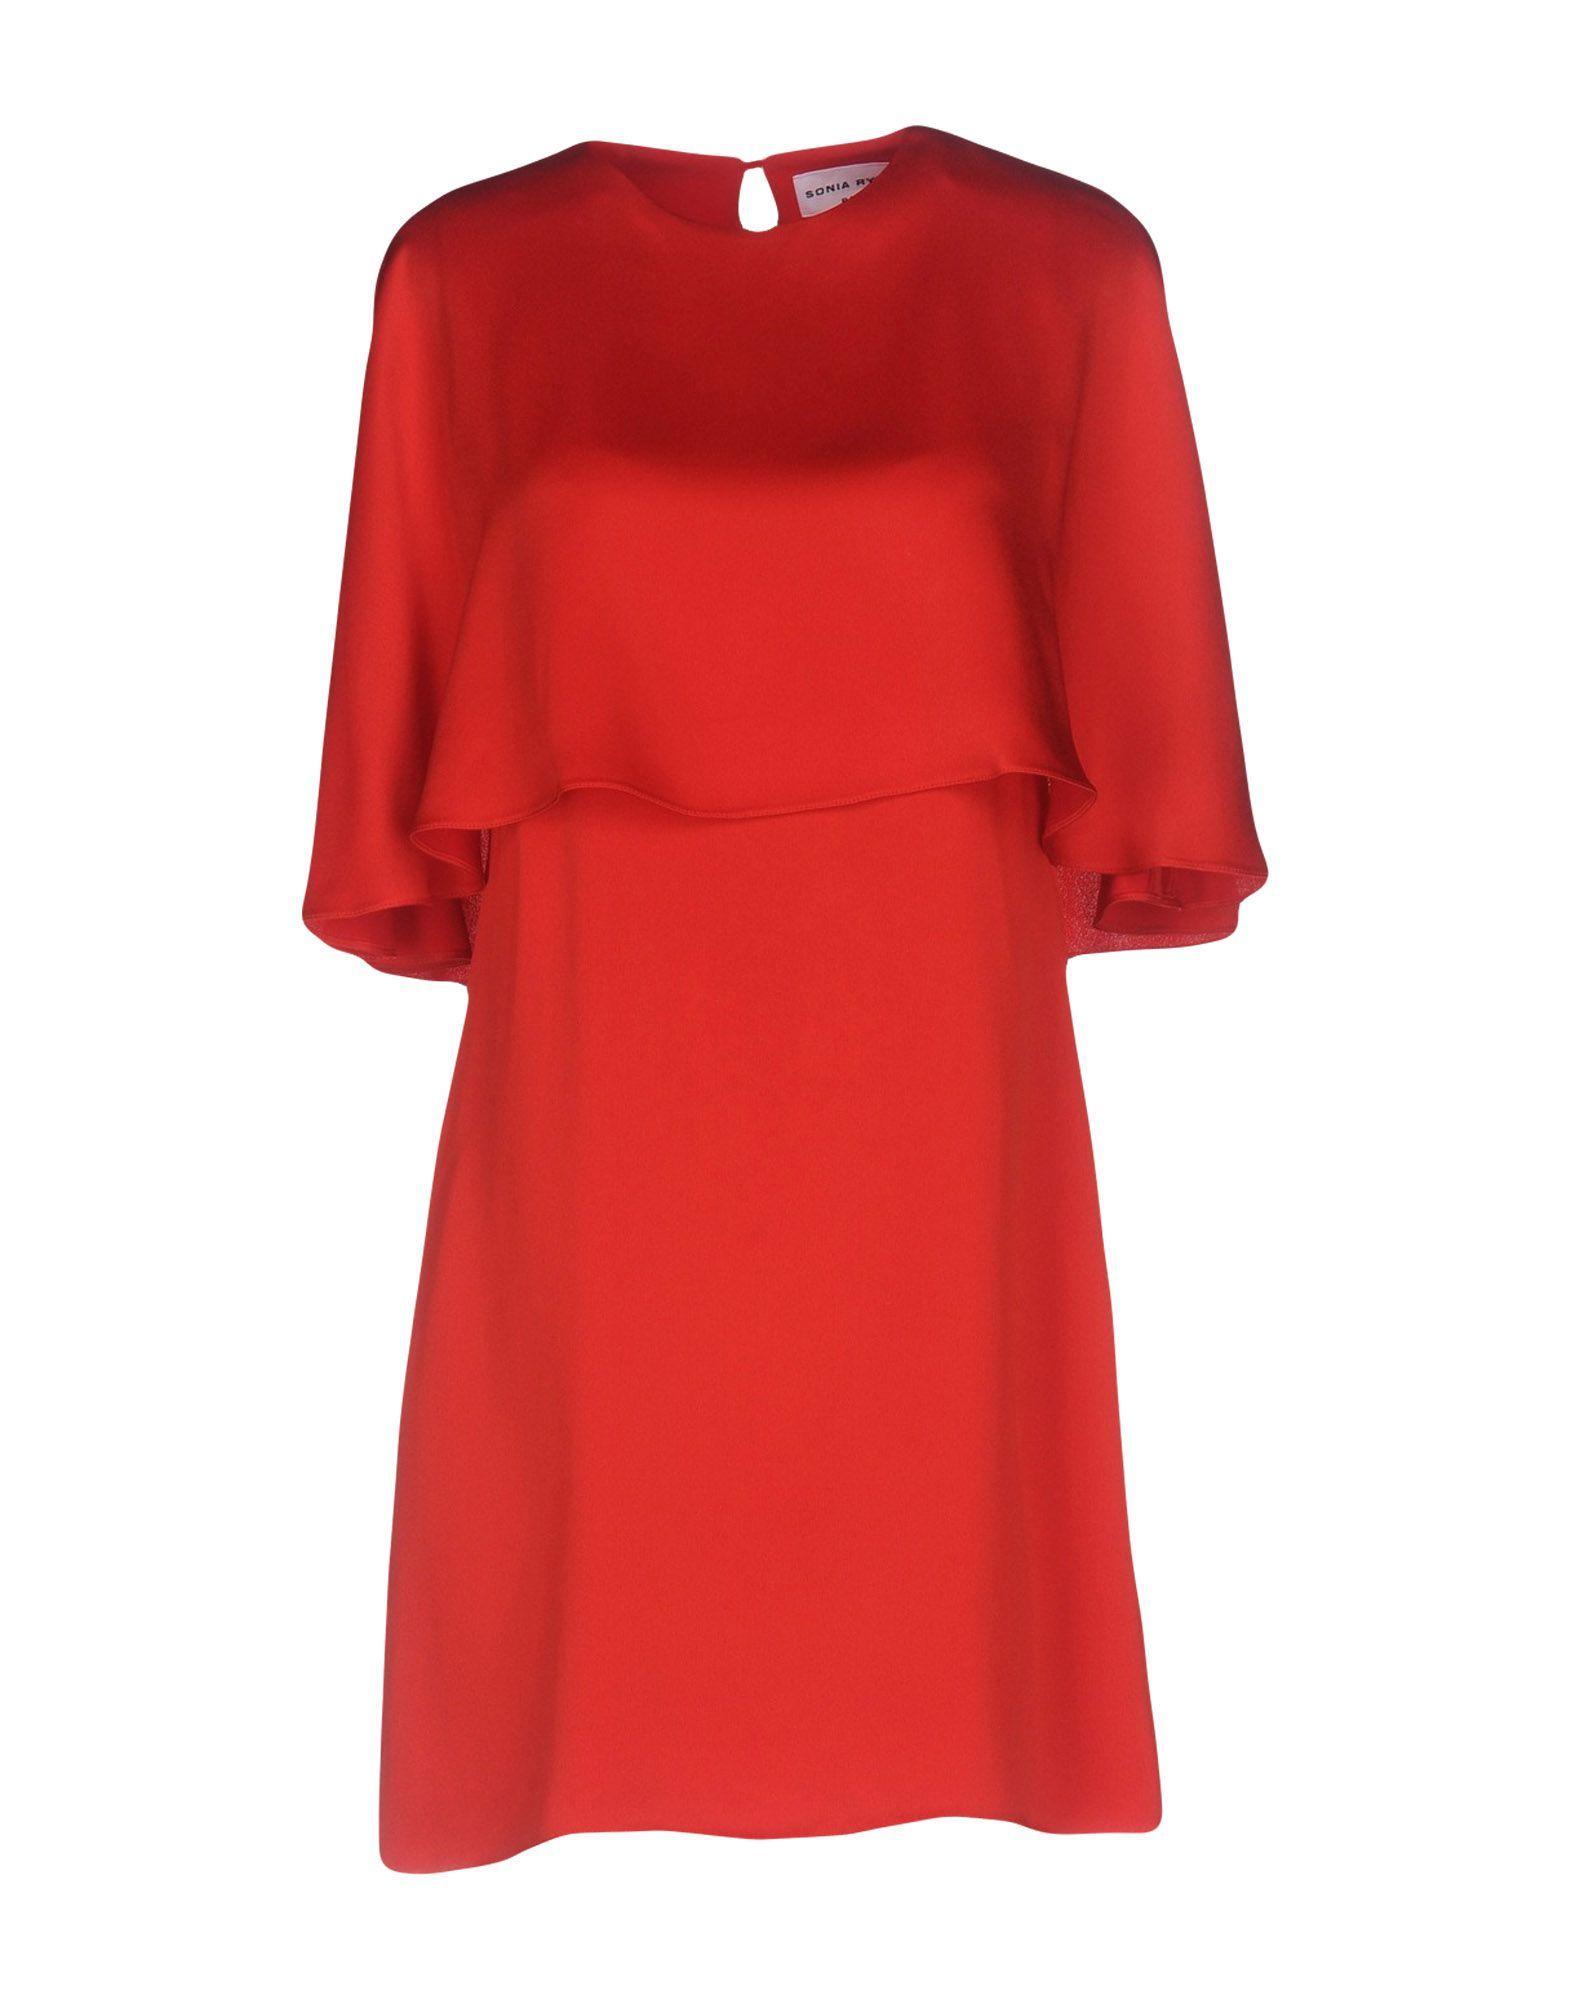 Sonia Rykiel Red Satin Short Sleeve Dress